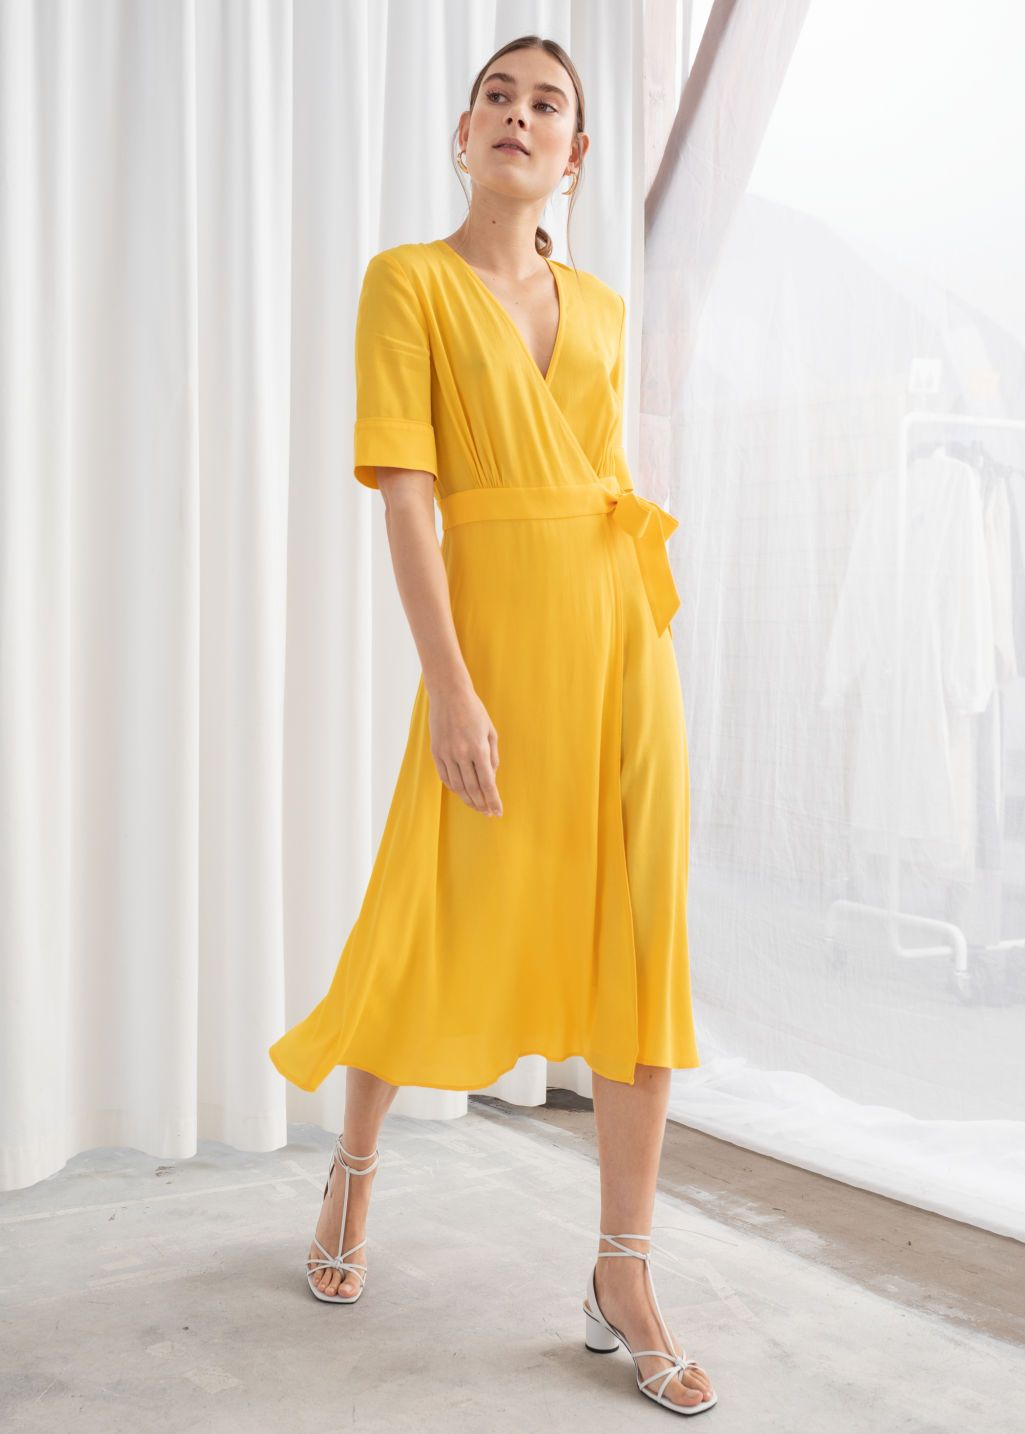 Midi Wrap Dress Affordable Summer Dresses Yellow Dress Yellow Dress Outfit [ 1434 x 1025 Pixel ]